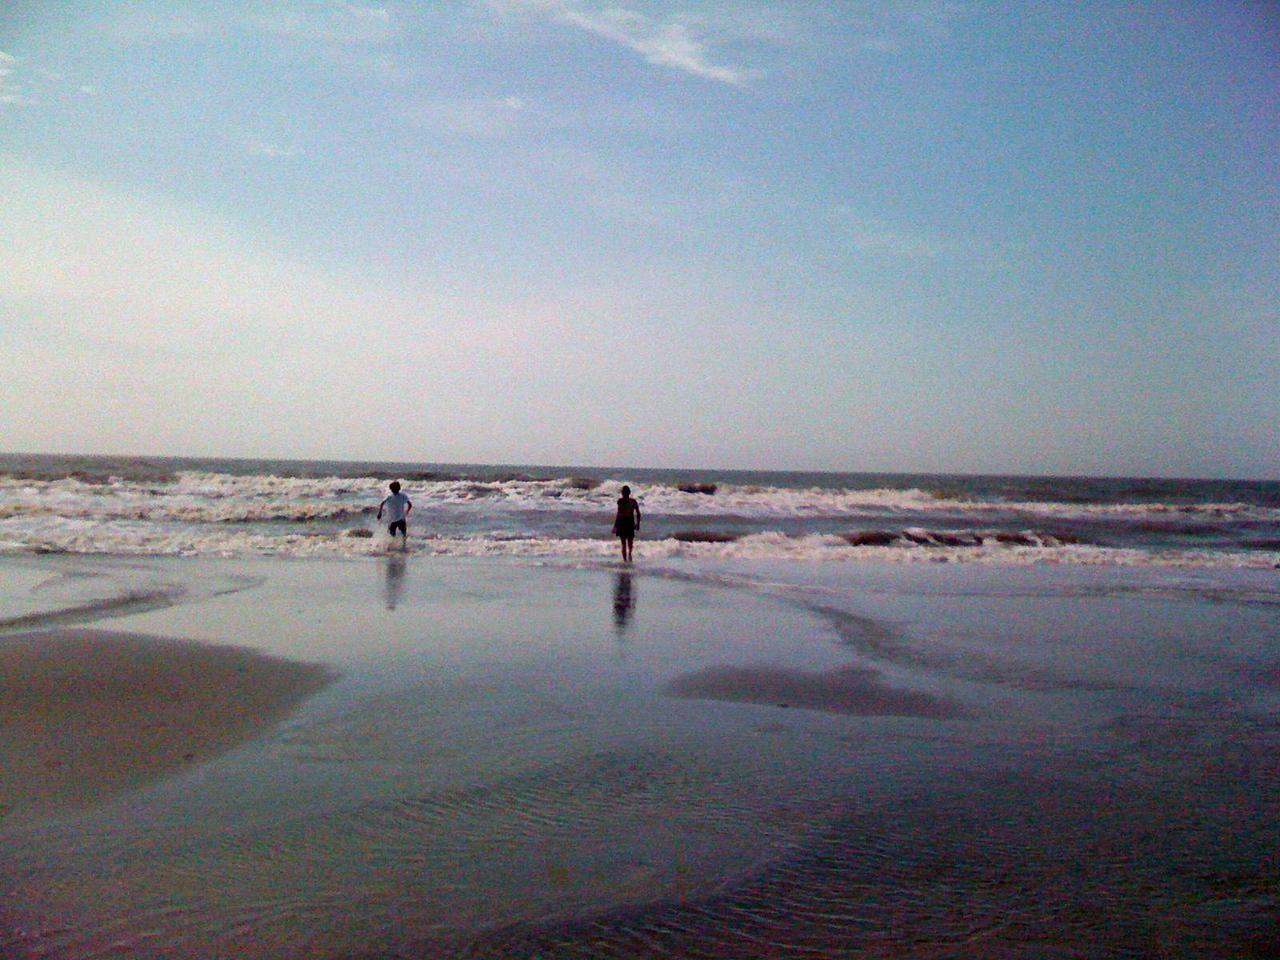 I love watching them enjoy the beach.